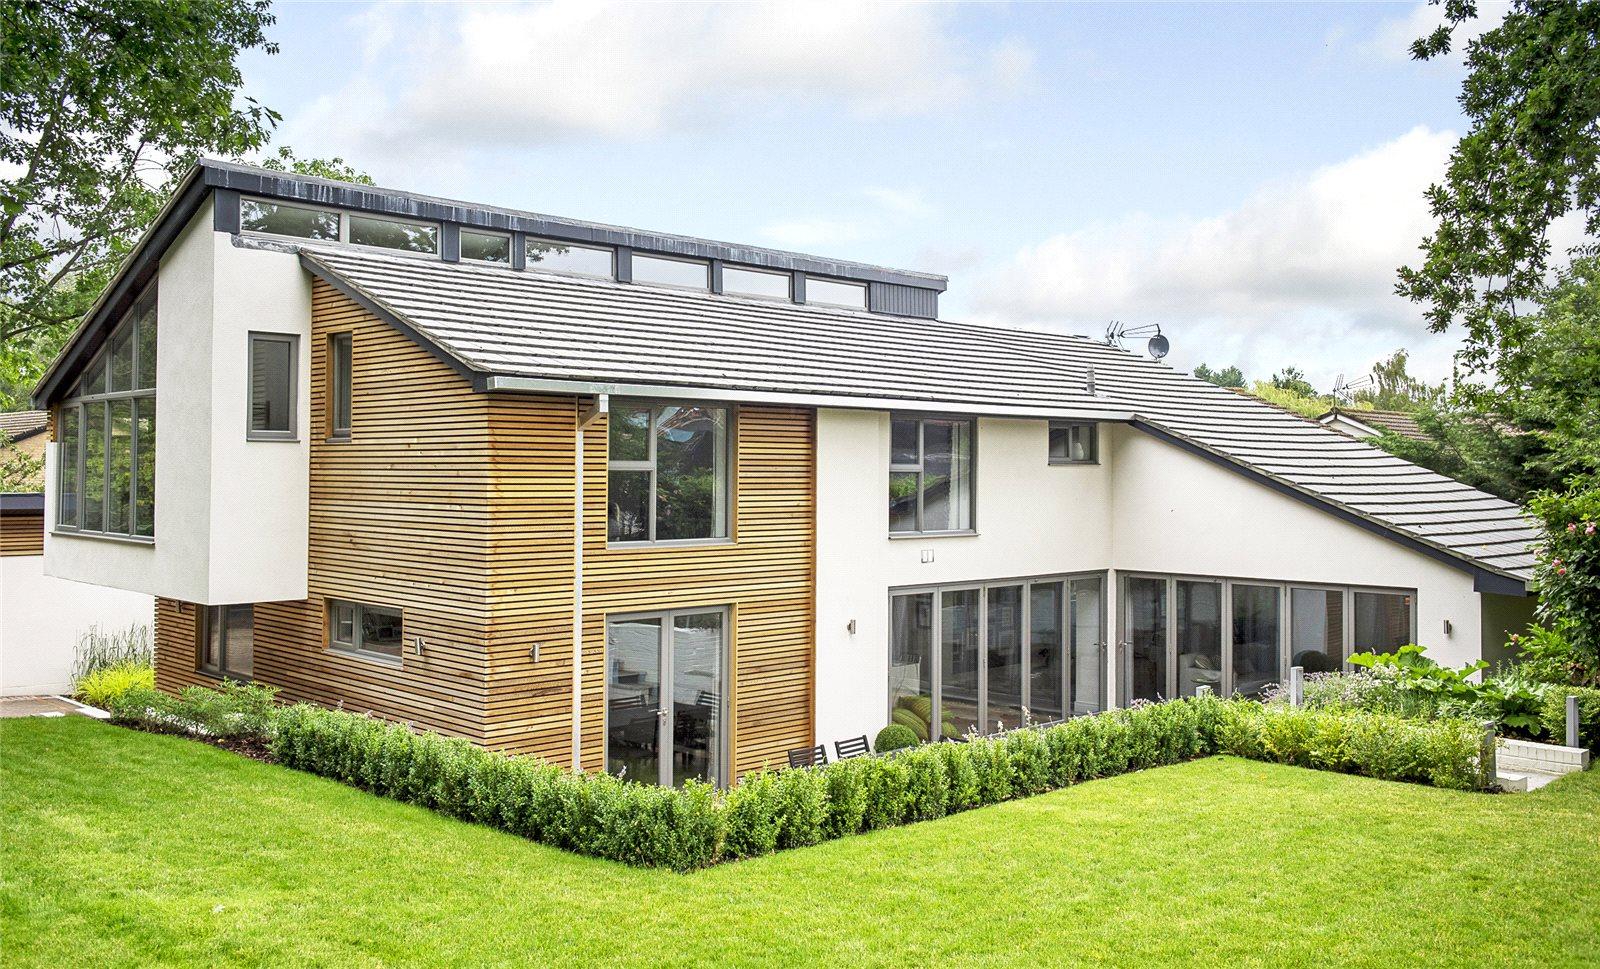 Villa per Vendita alle ore Burleigh Lane, Ascot, Berkshire, SL5 Ascot, Inghilterra